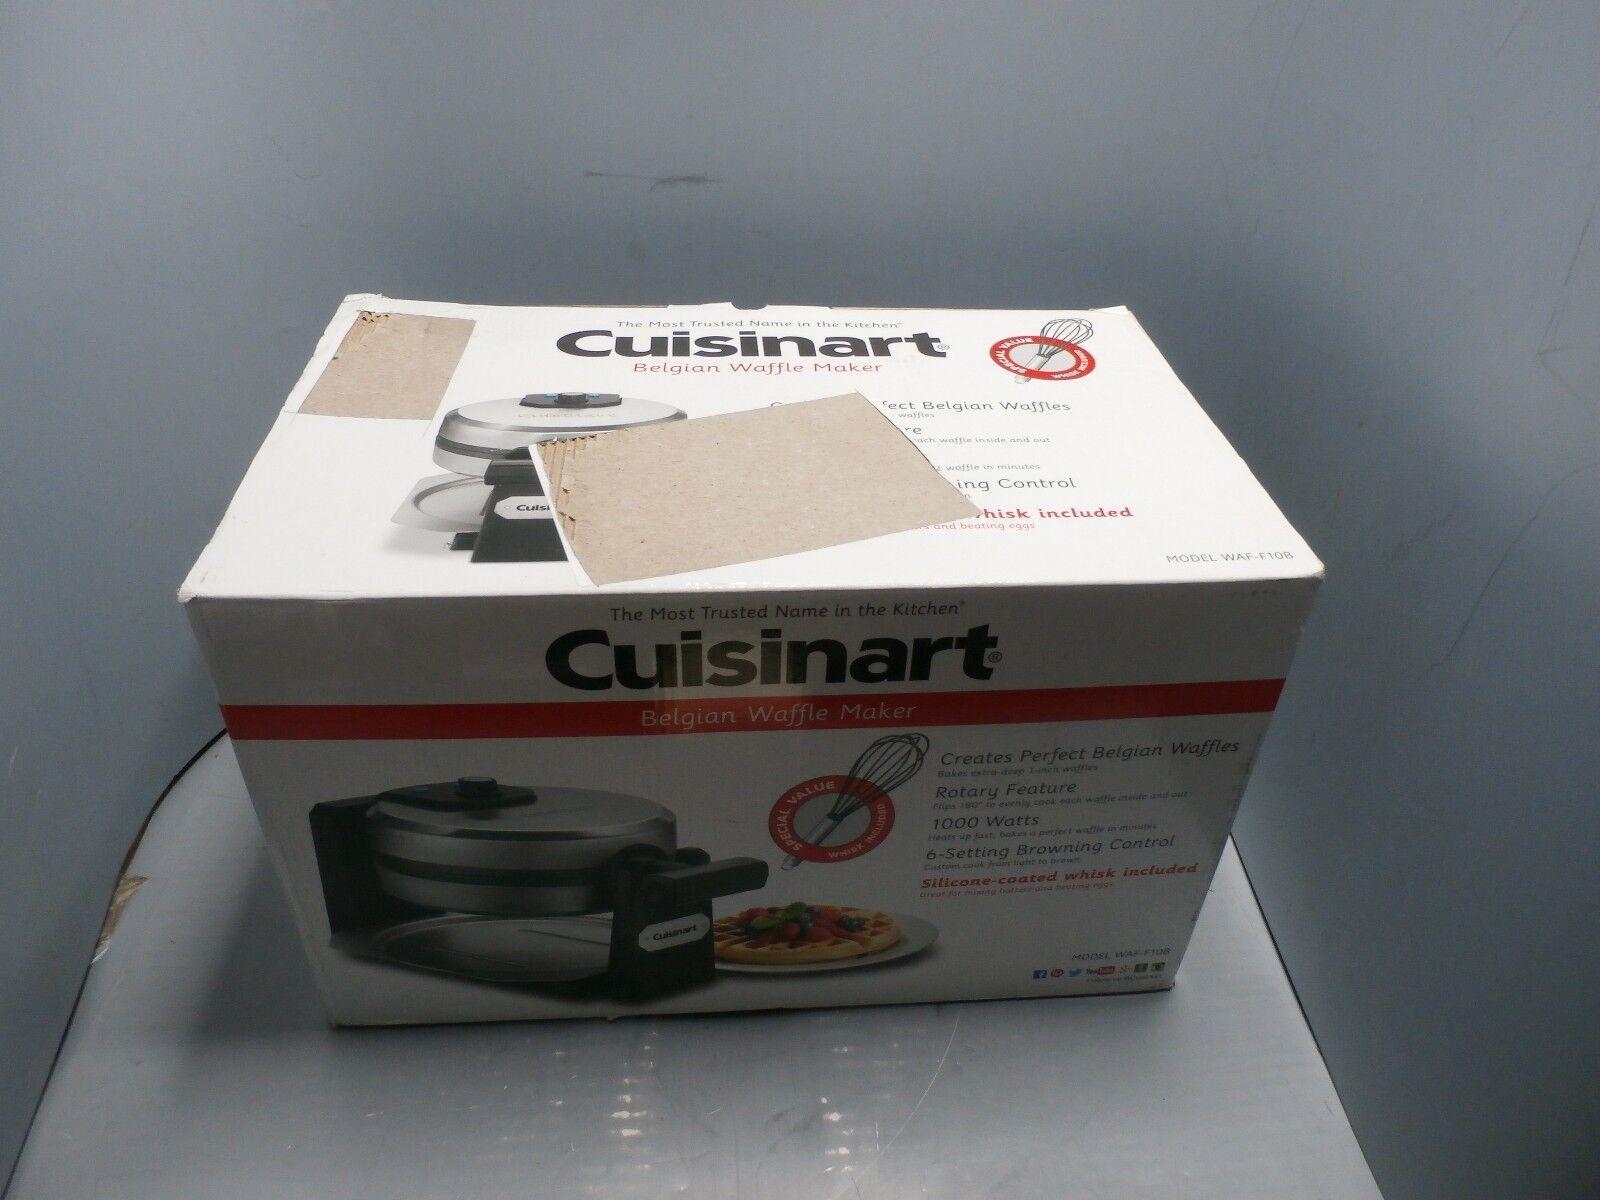 New Cuisinart Belgian Waffle Maker Stainless Steel WAF-F10B